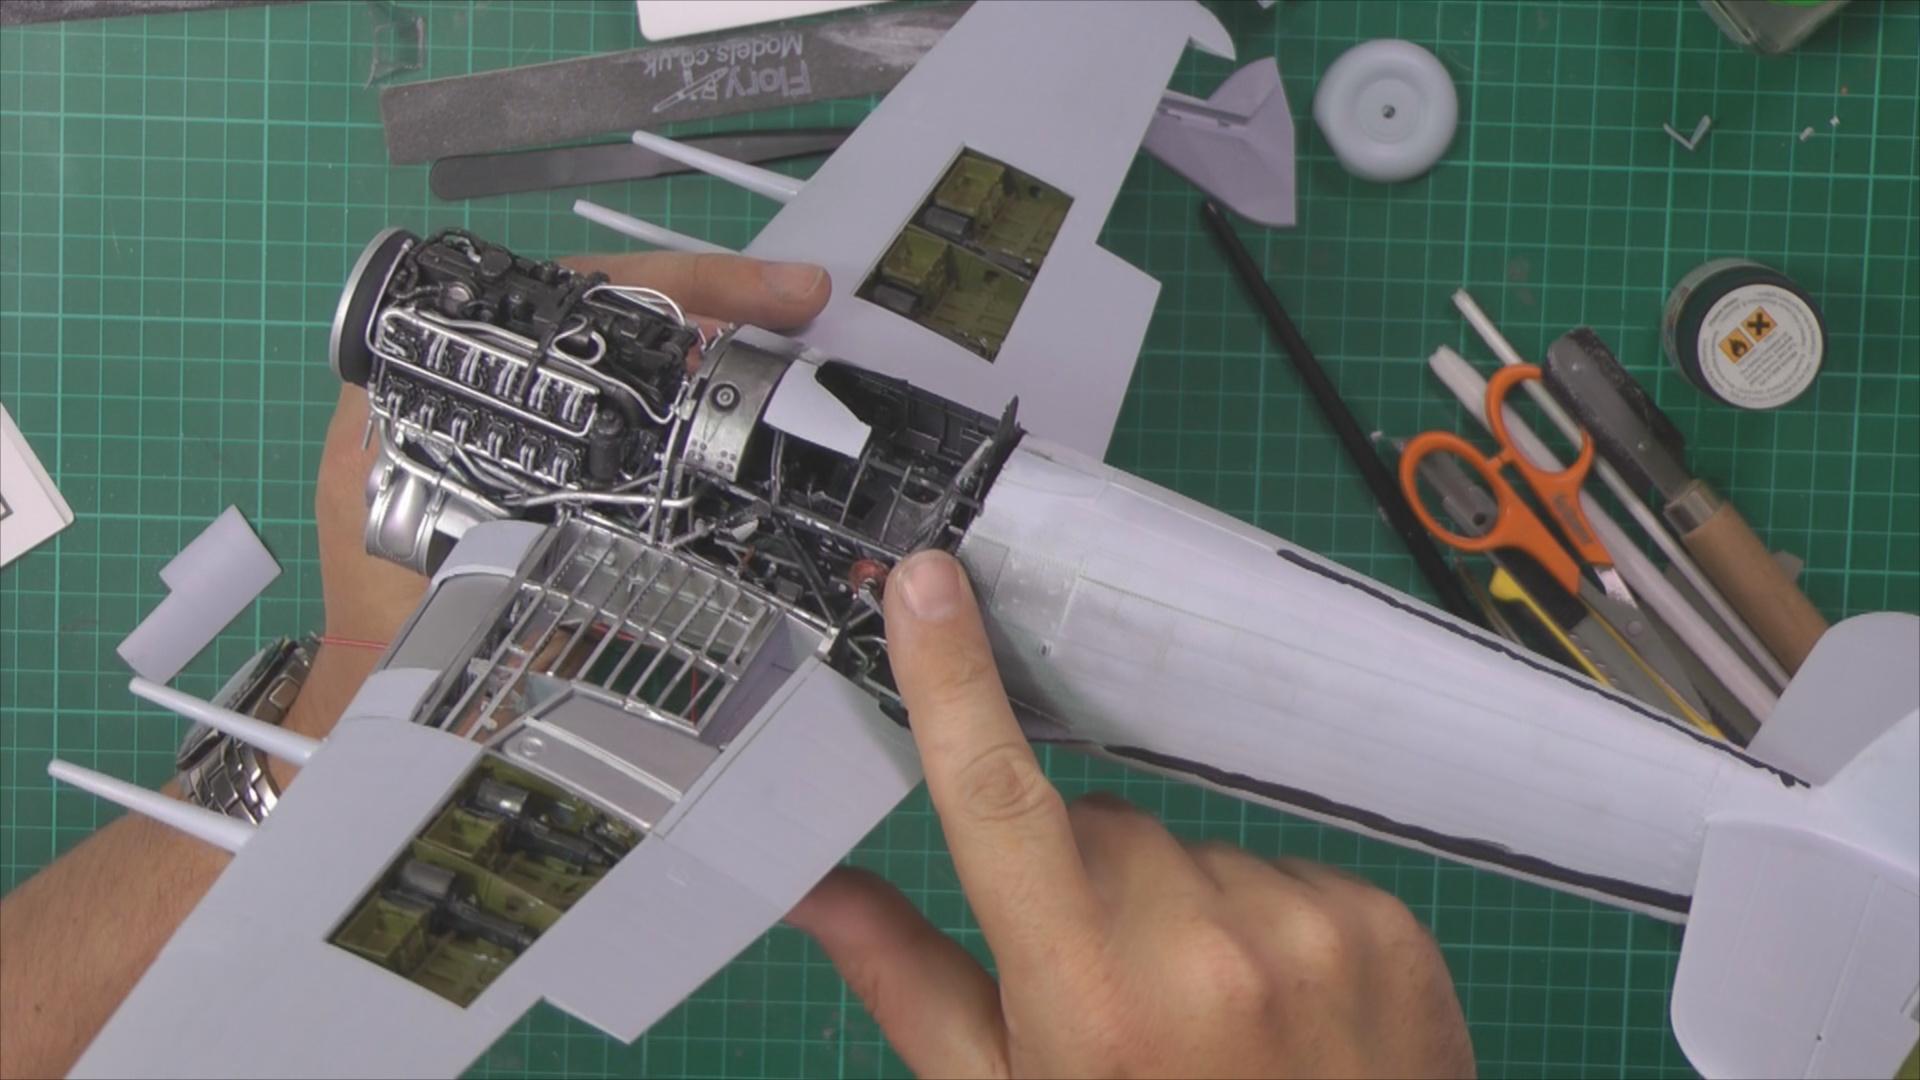 Hawker+Typhoon+Part+7+Pic+1.jpg